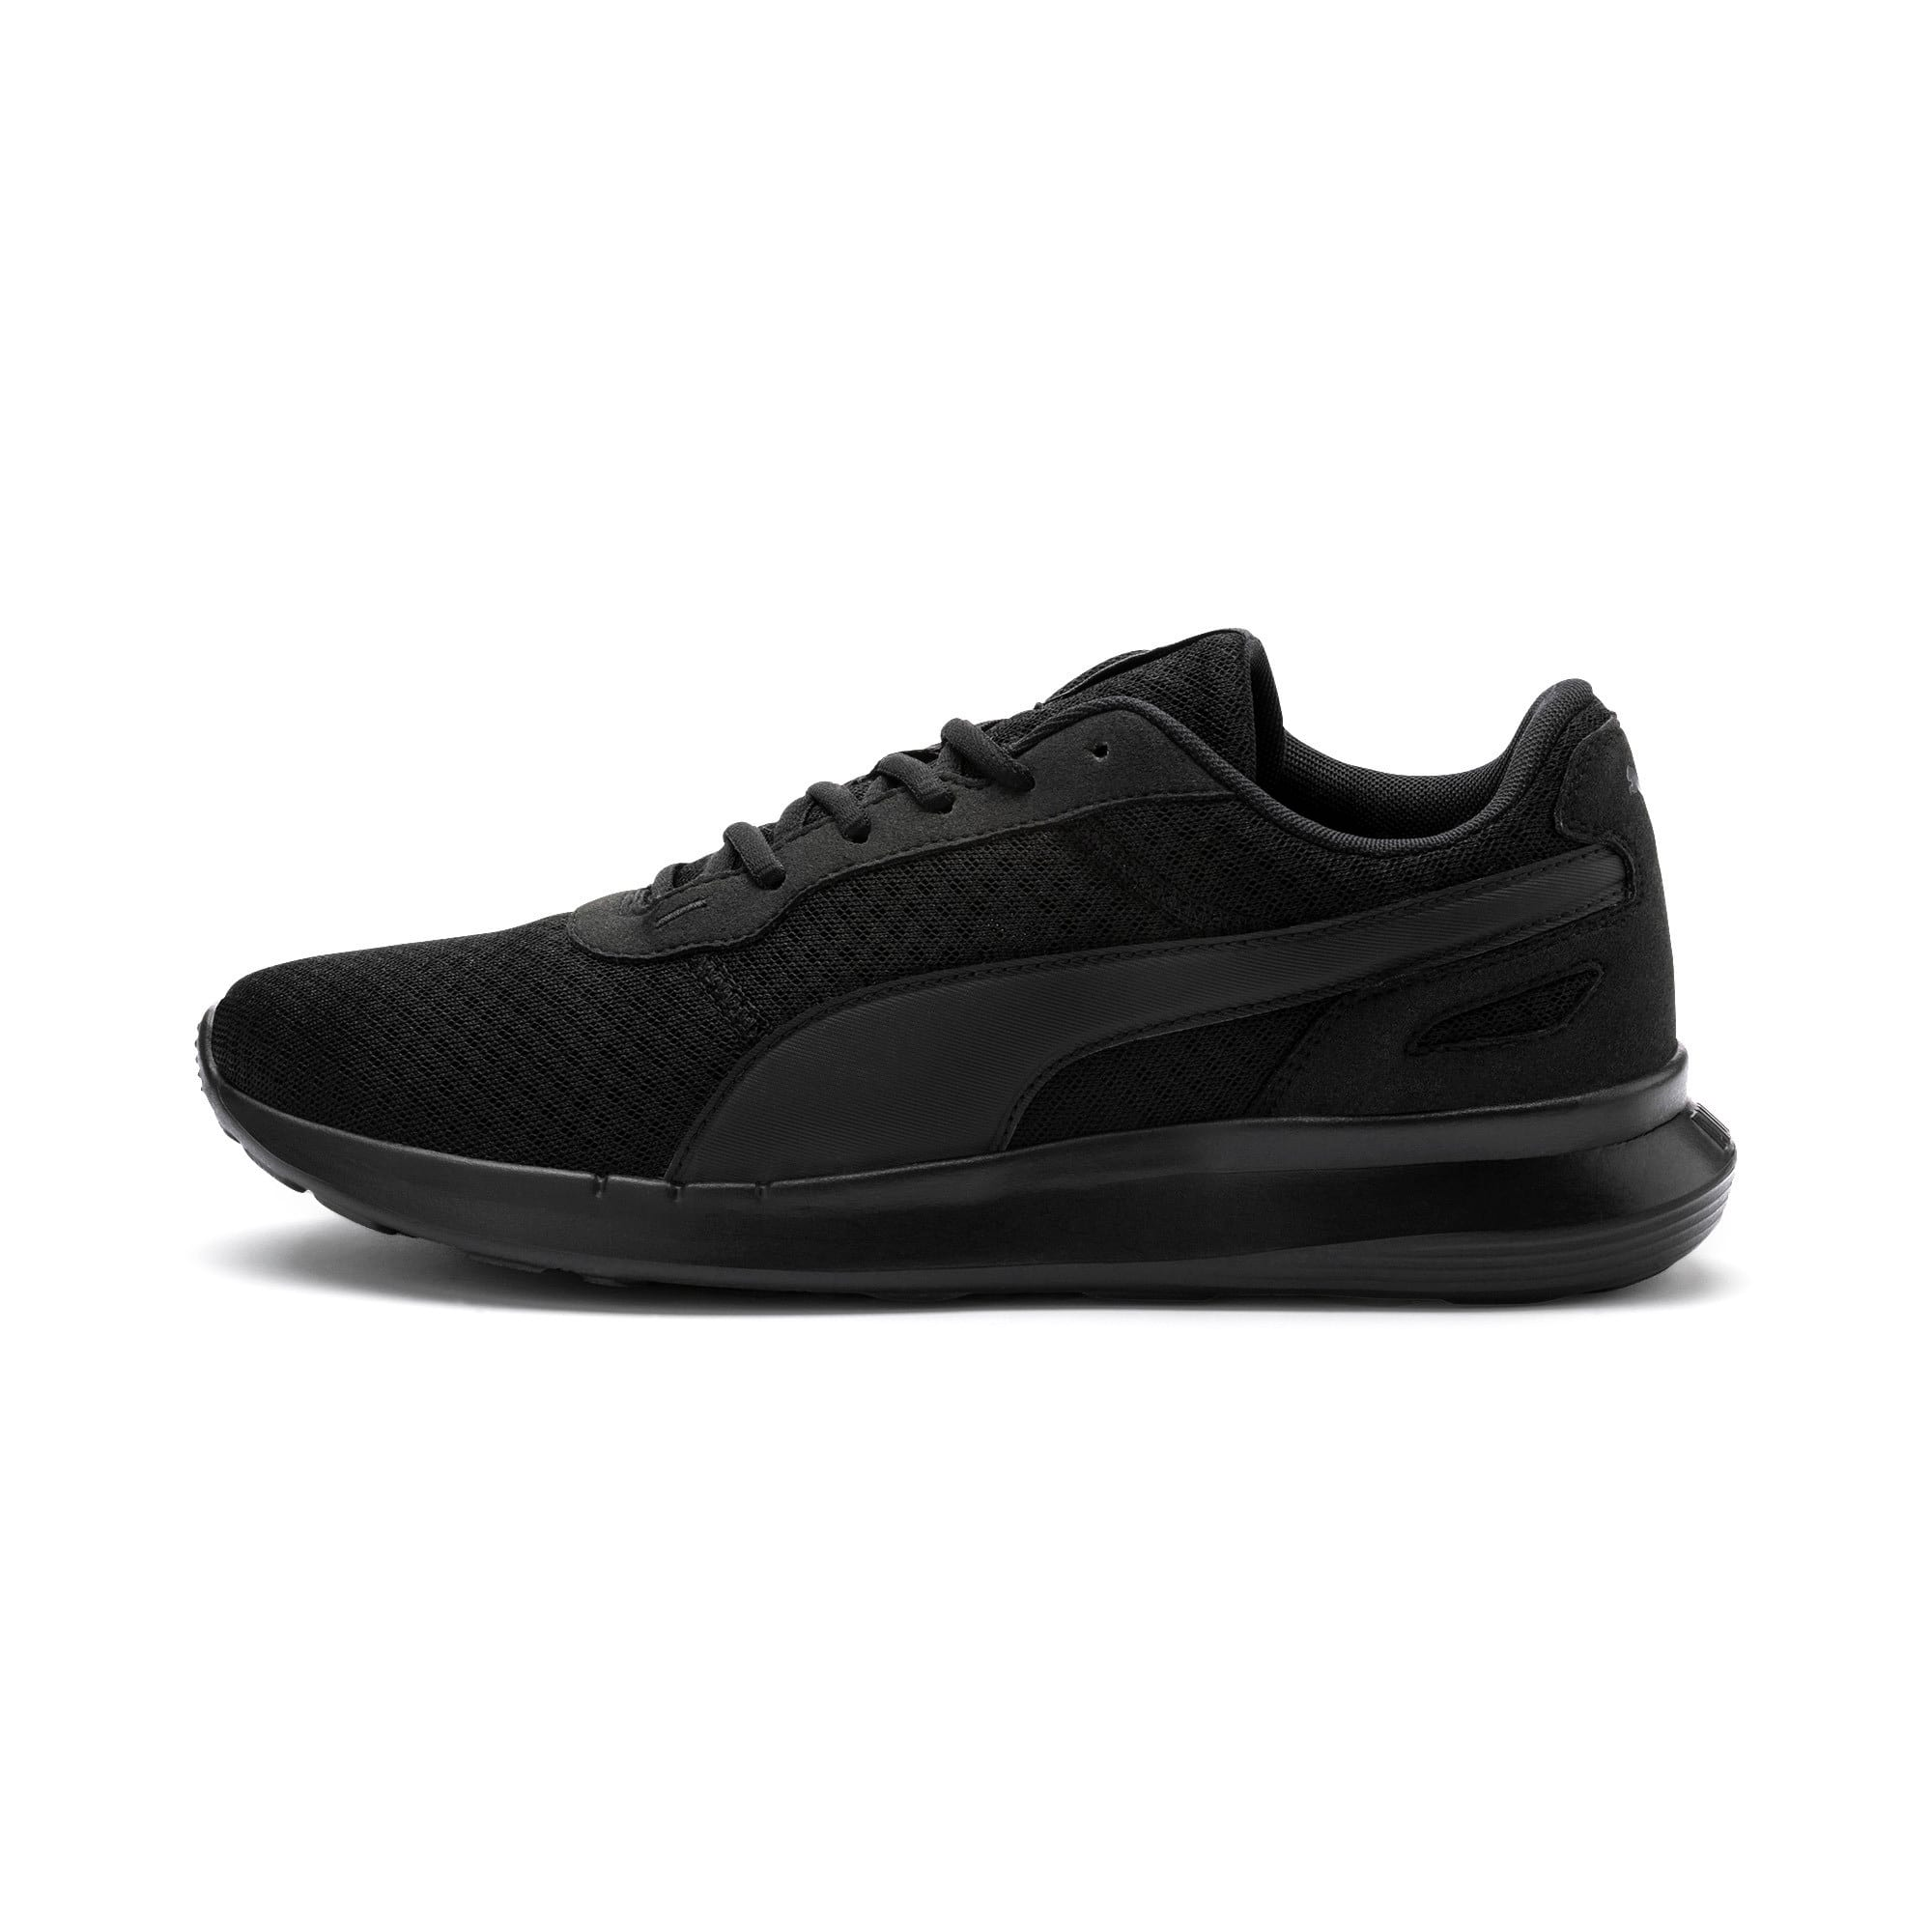 Thumbnail 1 of ST Activate Sneakers, Puma Black-Puma Black, medium